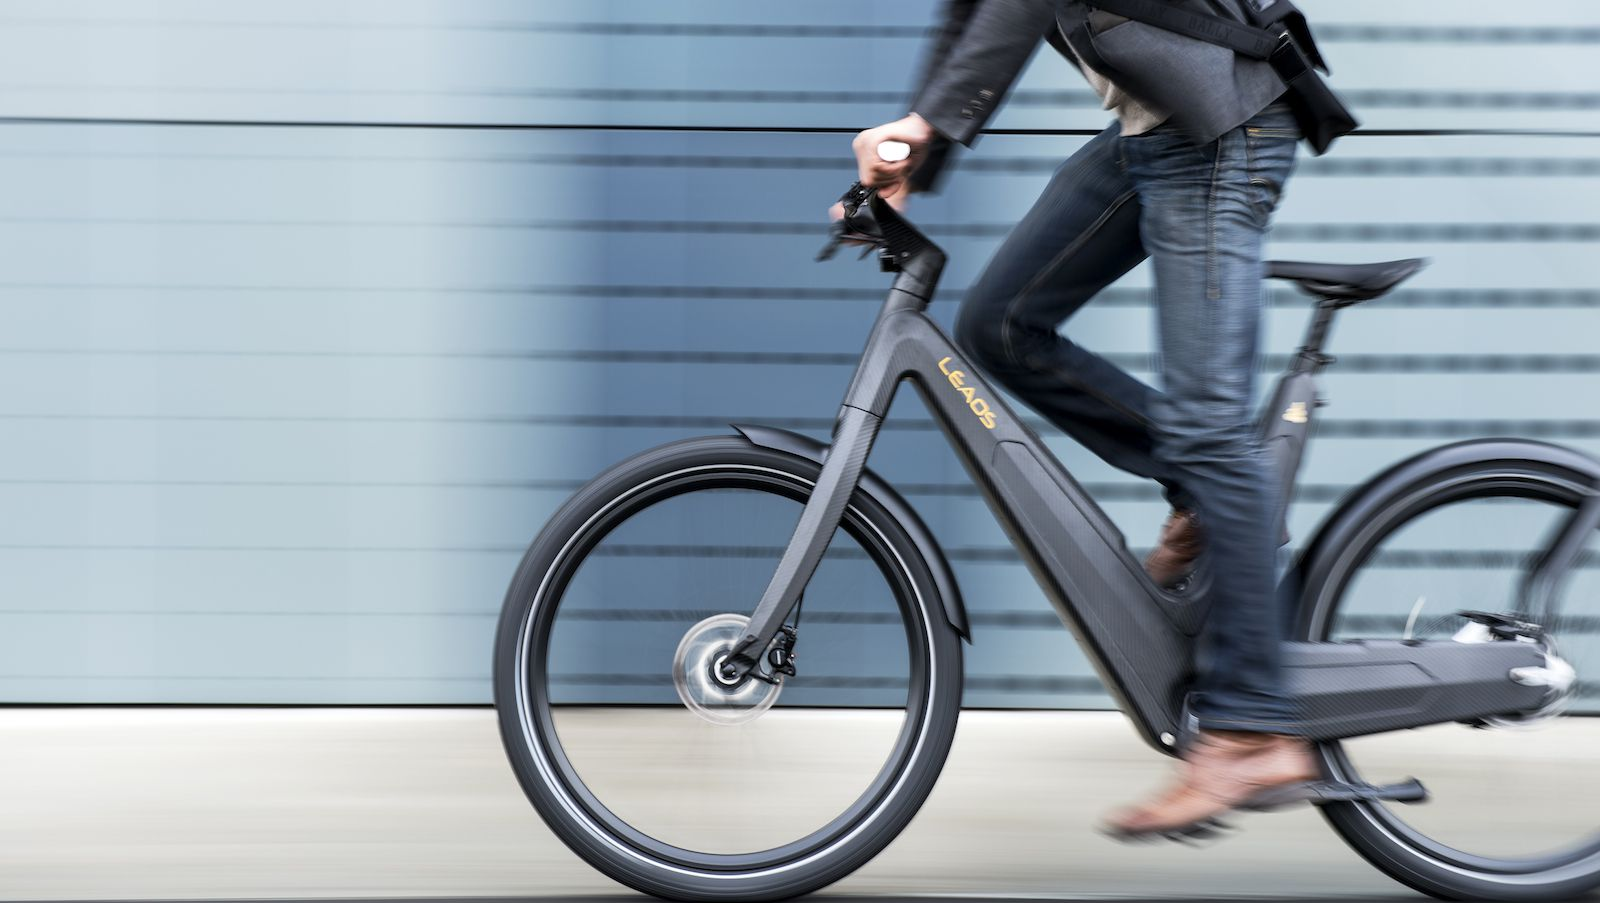 Man riding Leaos electric bicycle